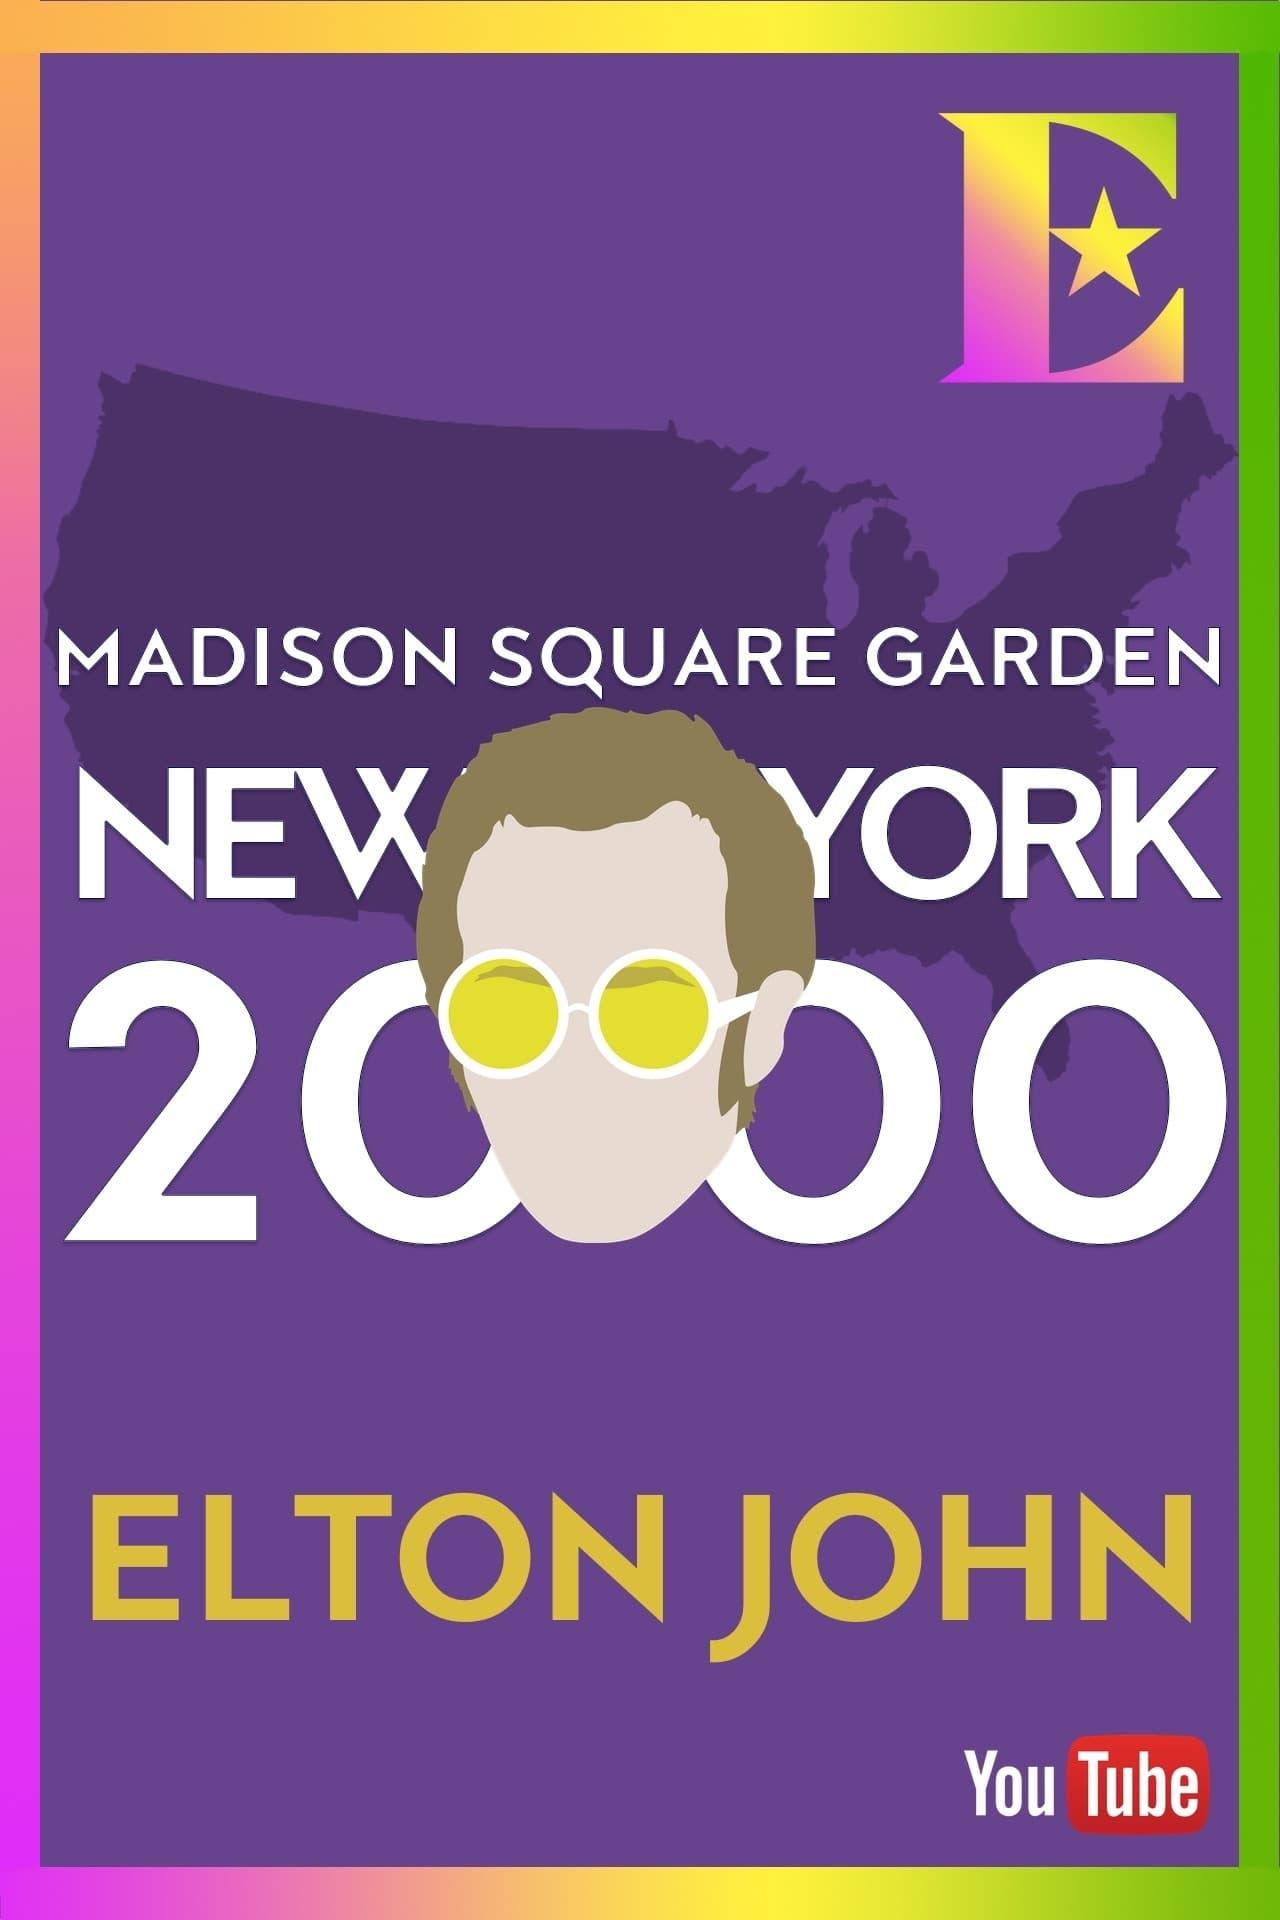 Elton John - Madison Square Garden